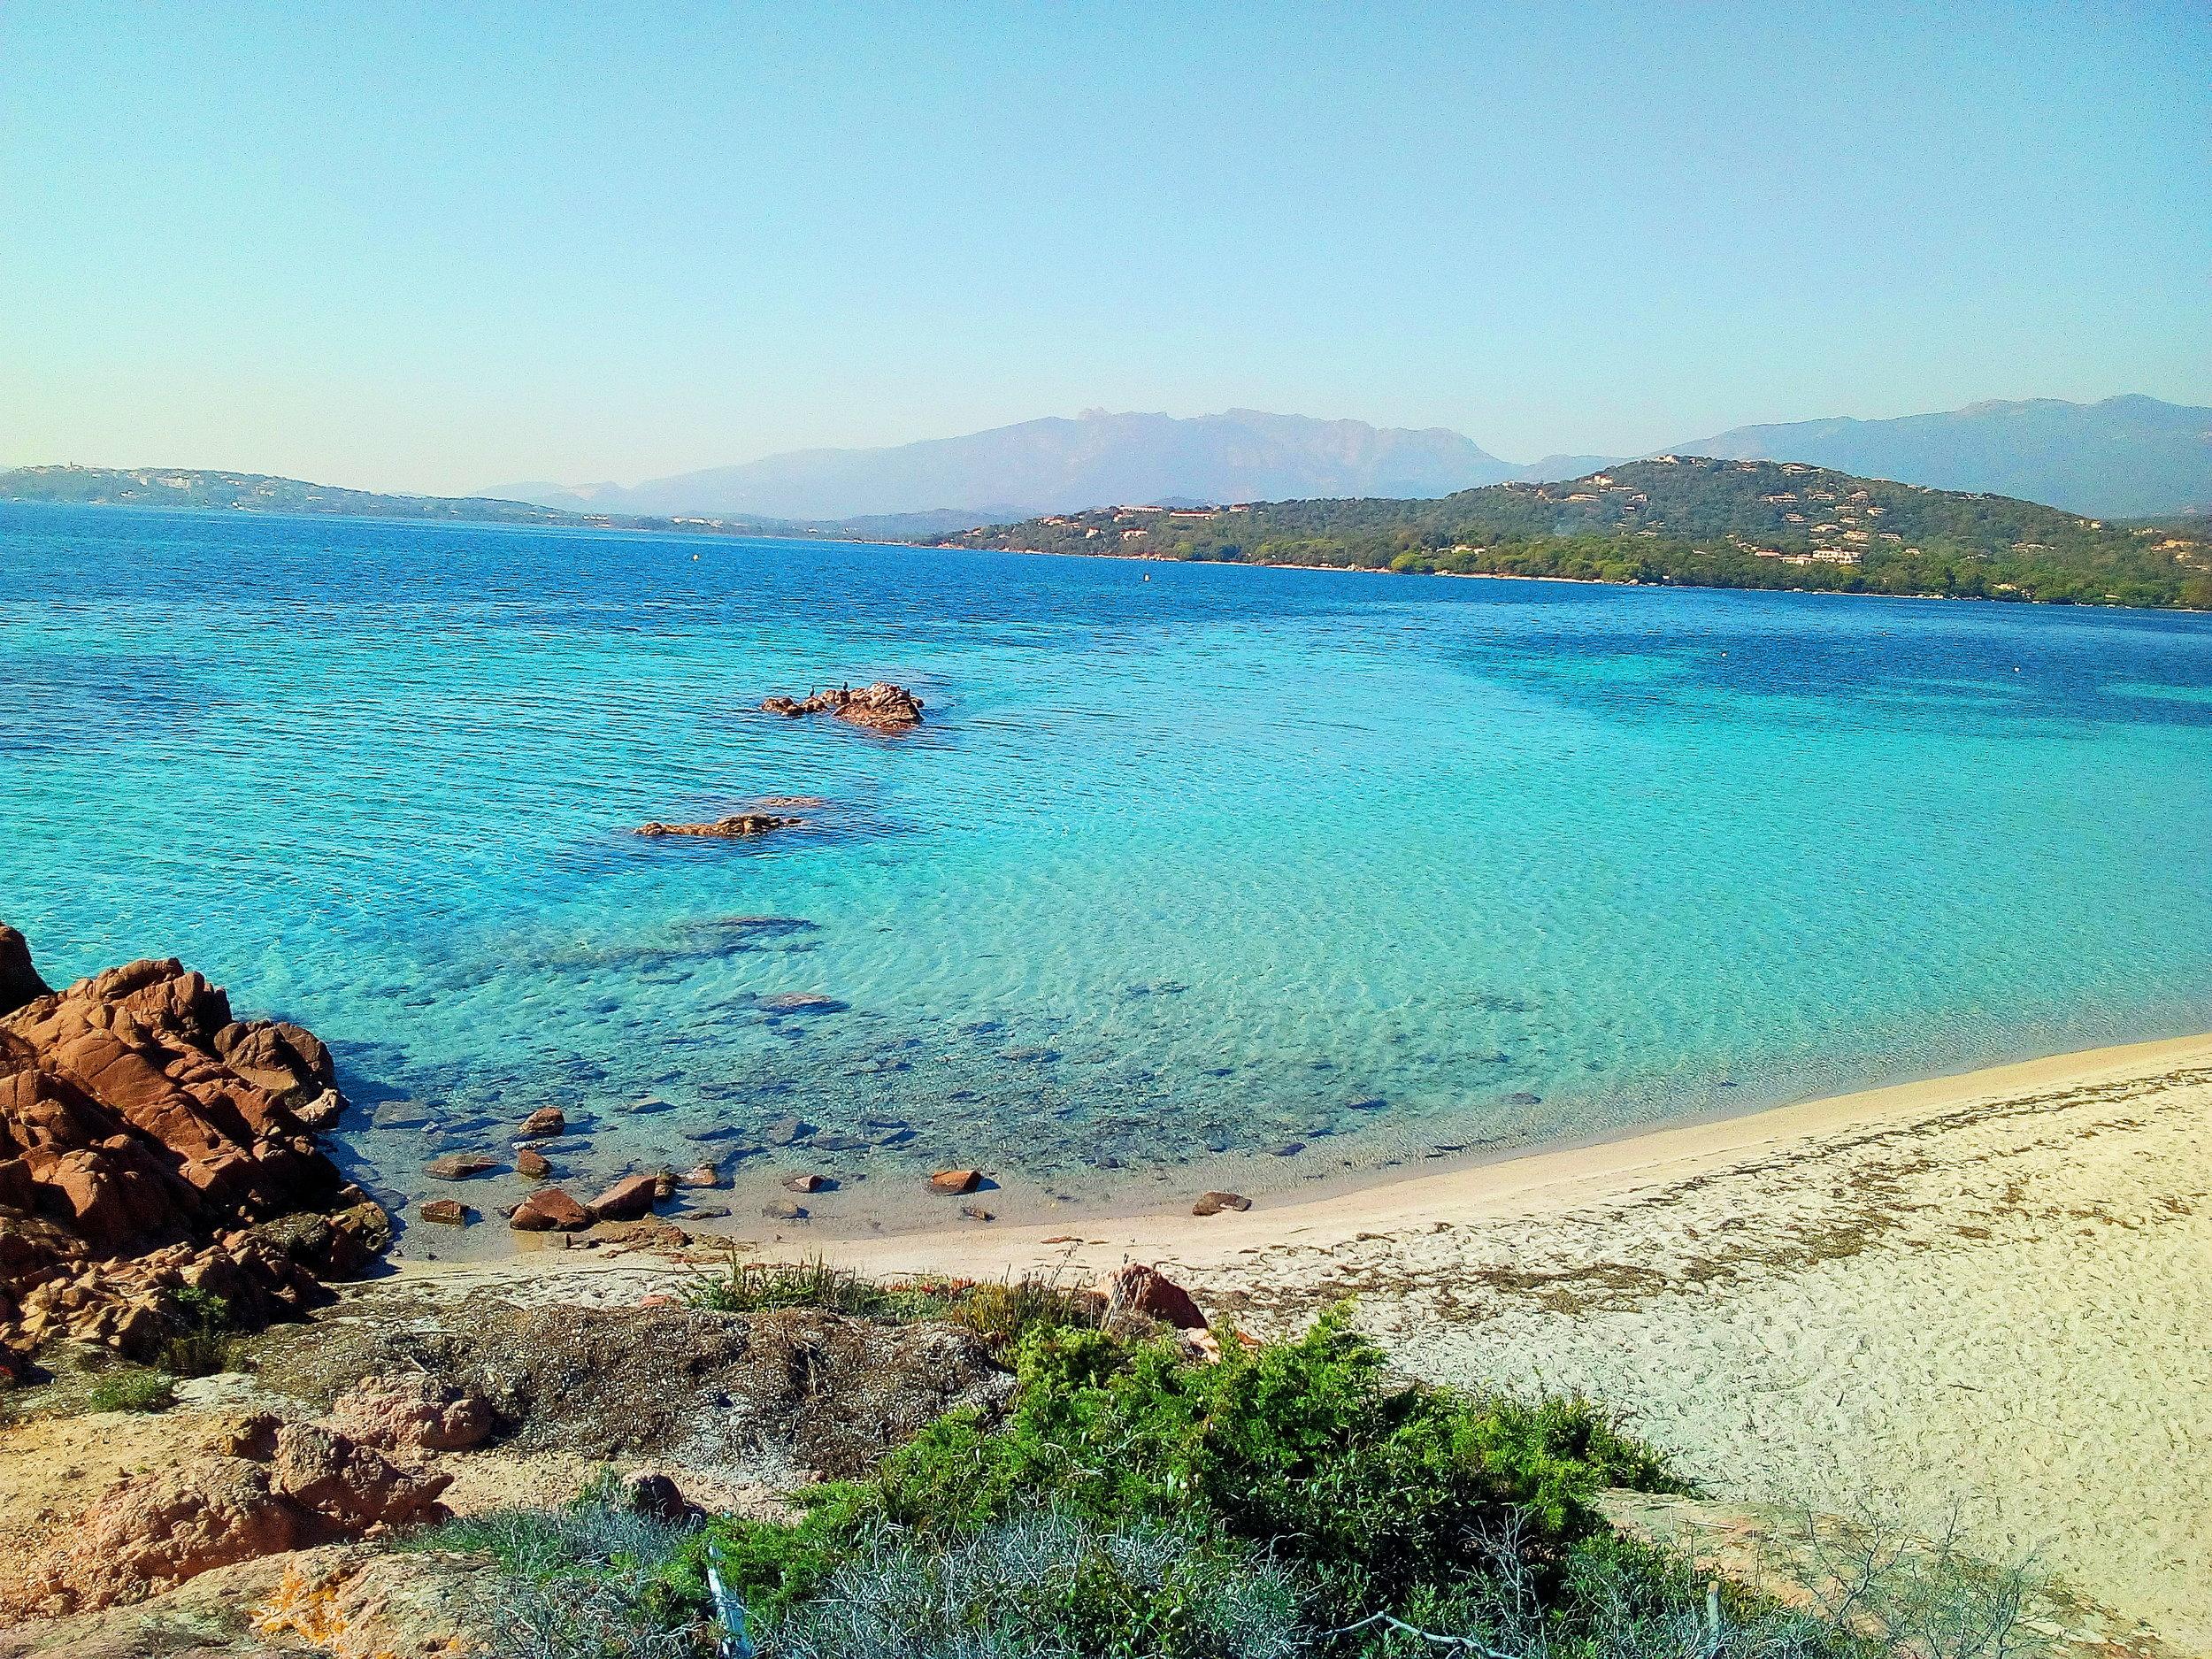 Plage de Bennedettu, Corsica